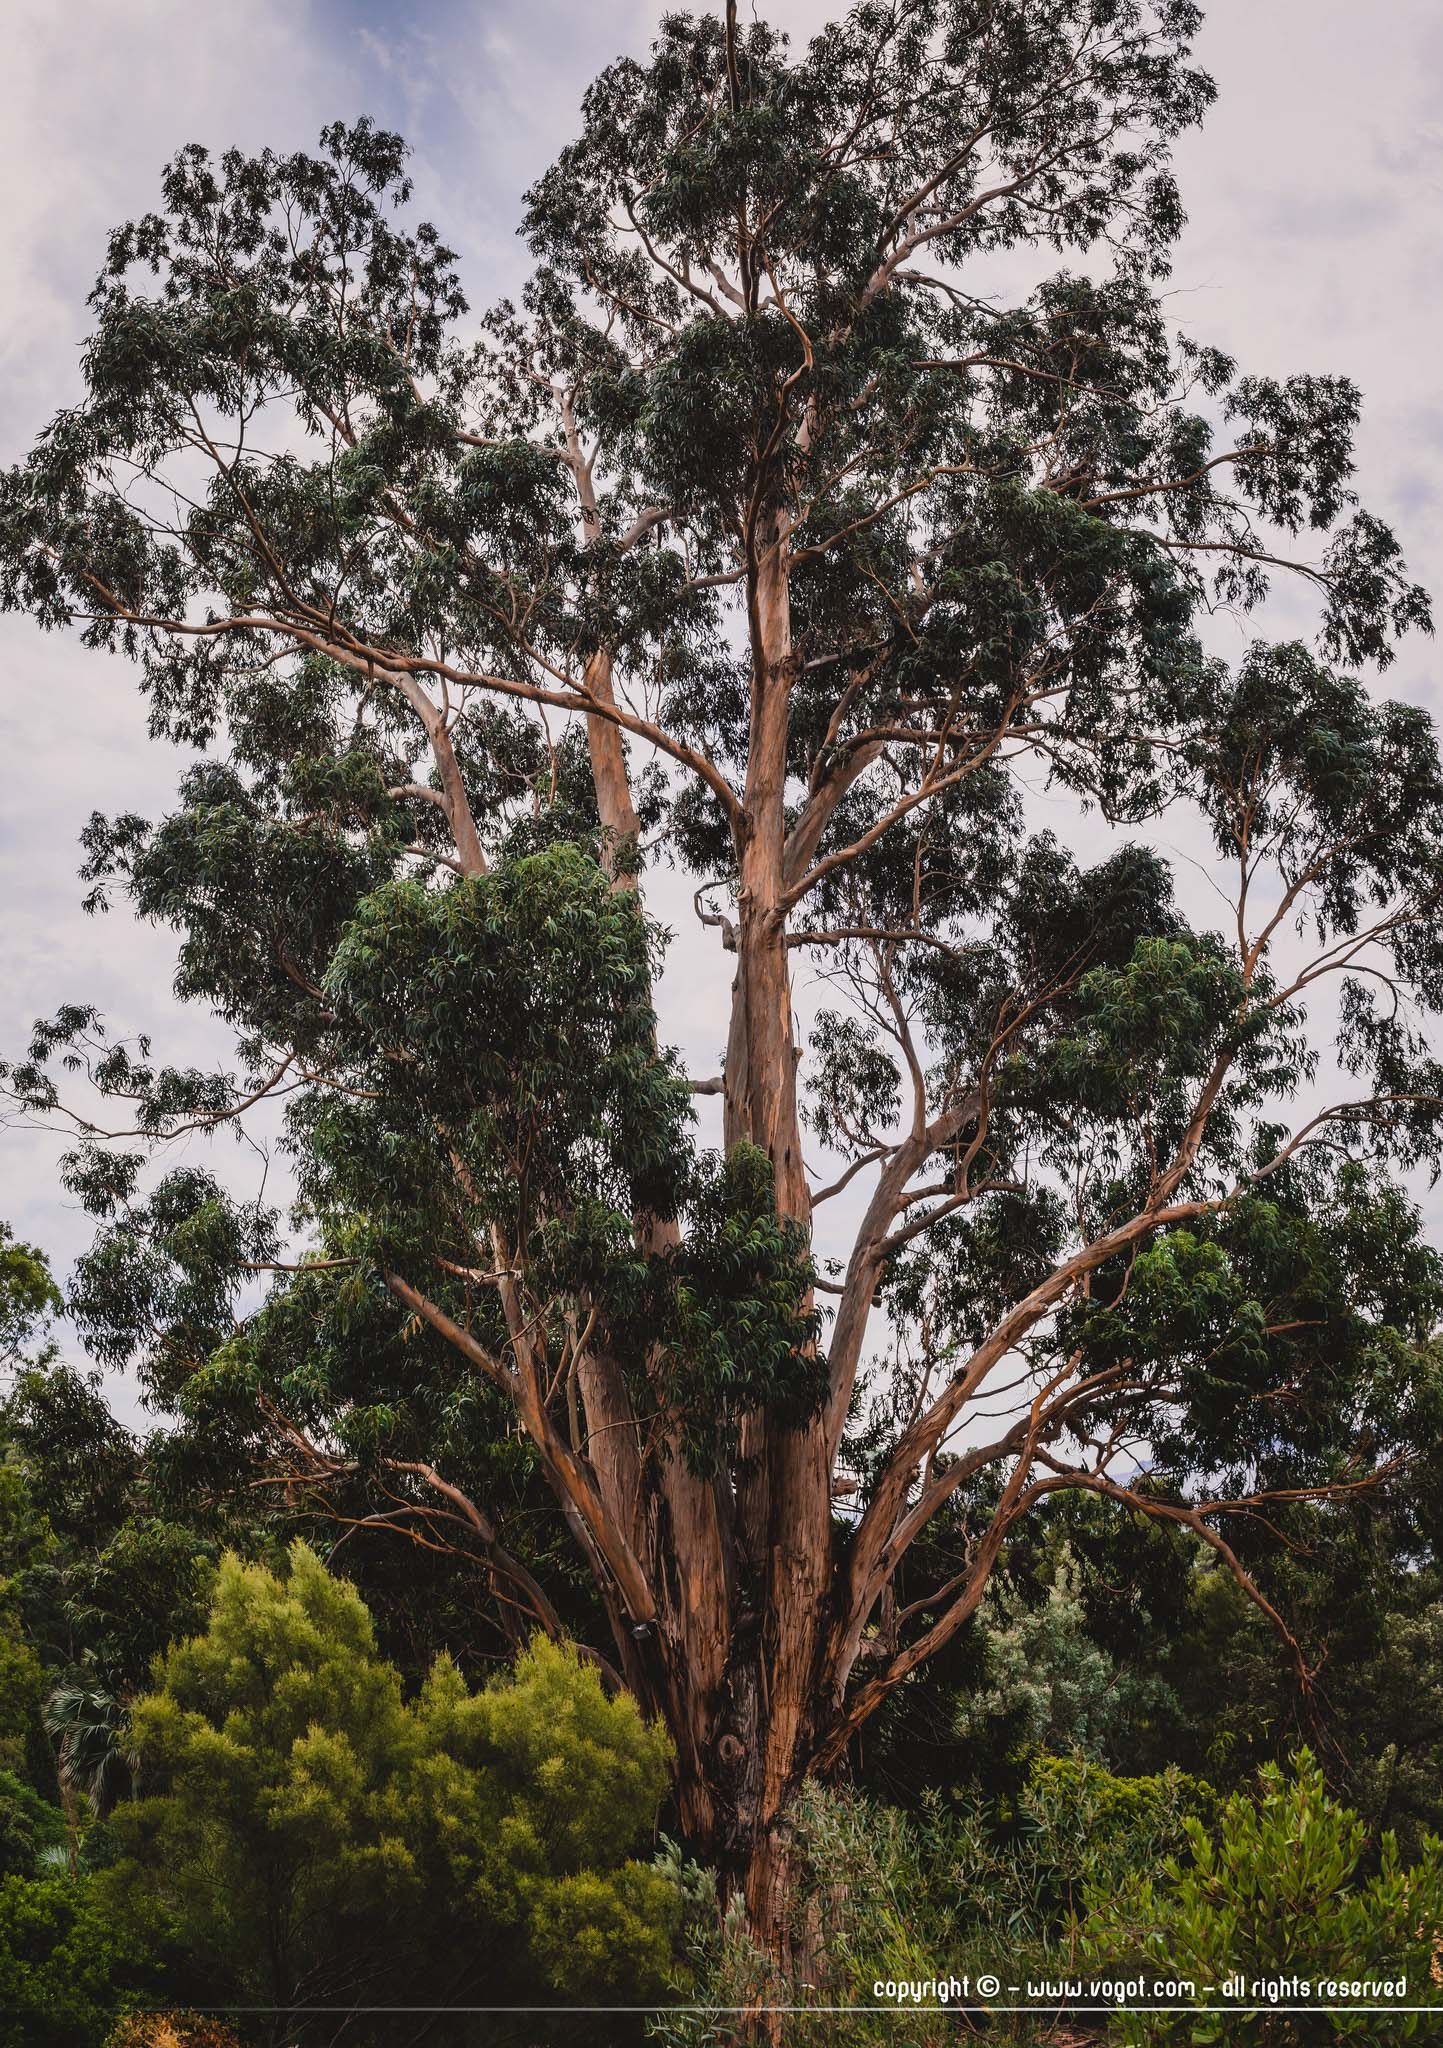 Domaine du Rayol - eucalyptus dans le jardin d'Australie